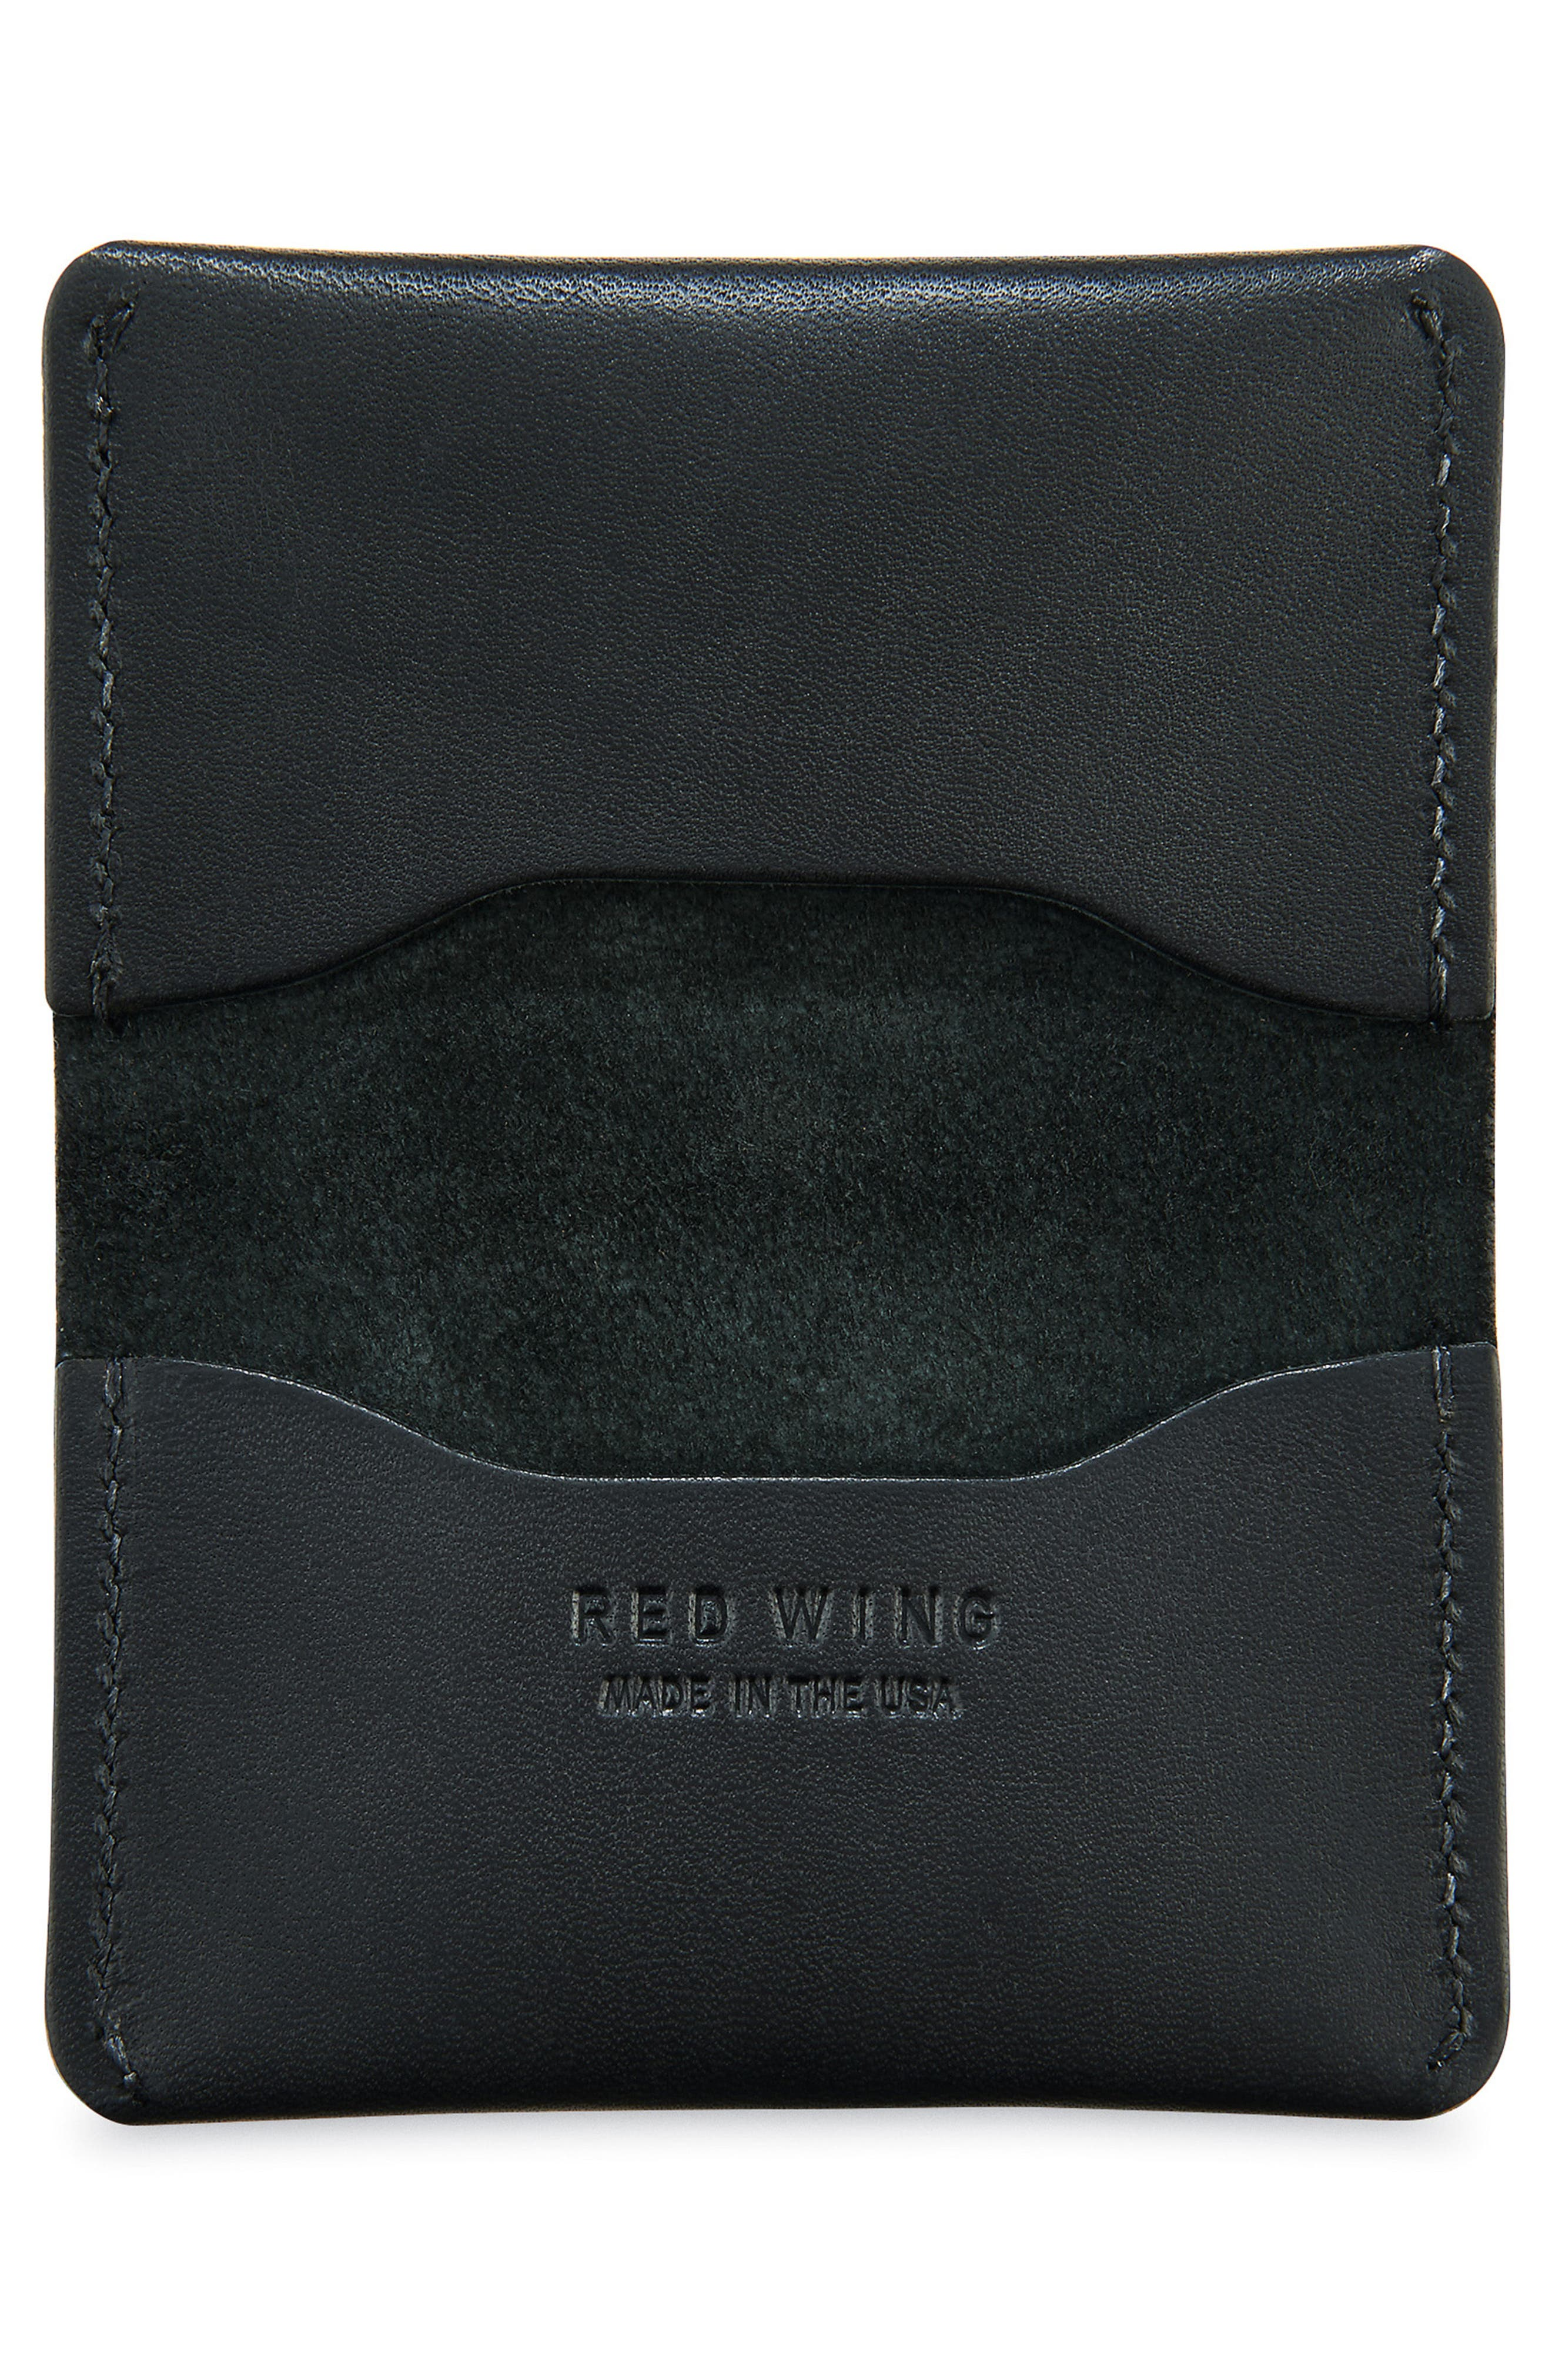 Leather Card Holder,                             Alternate thumbnail 2, color,                             Black